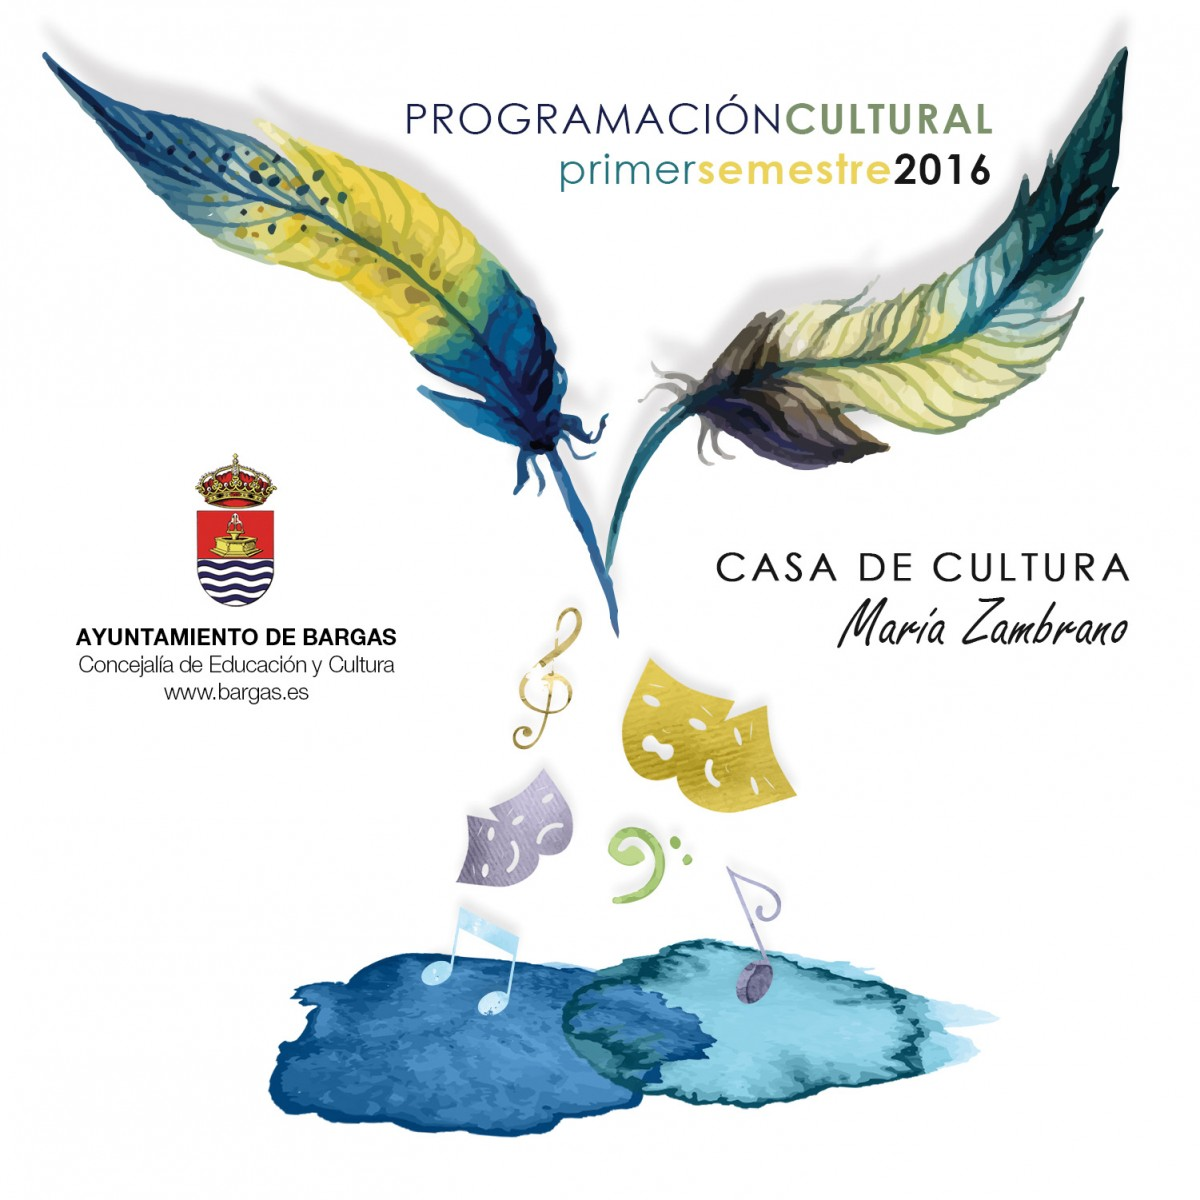 Programación Cultural Primer Semestre 2016